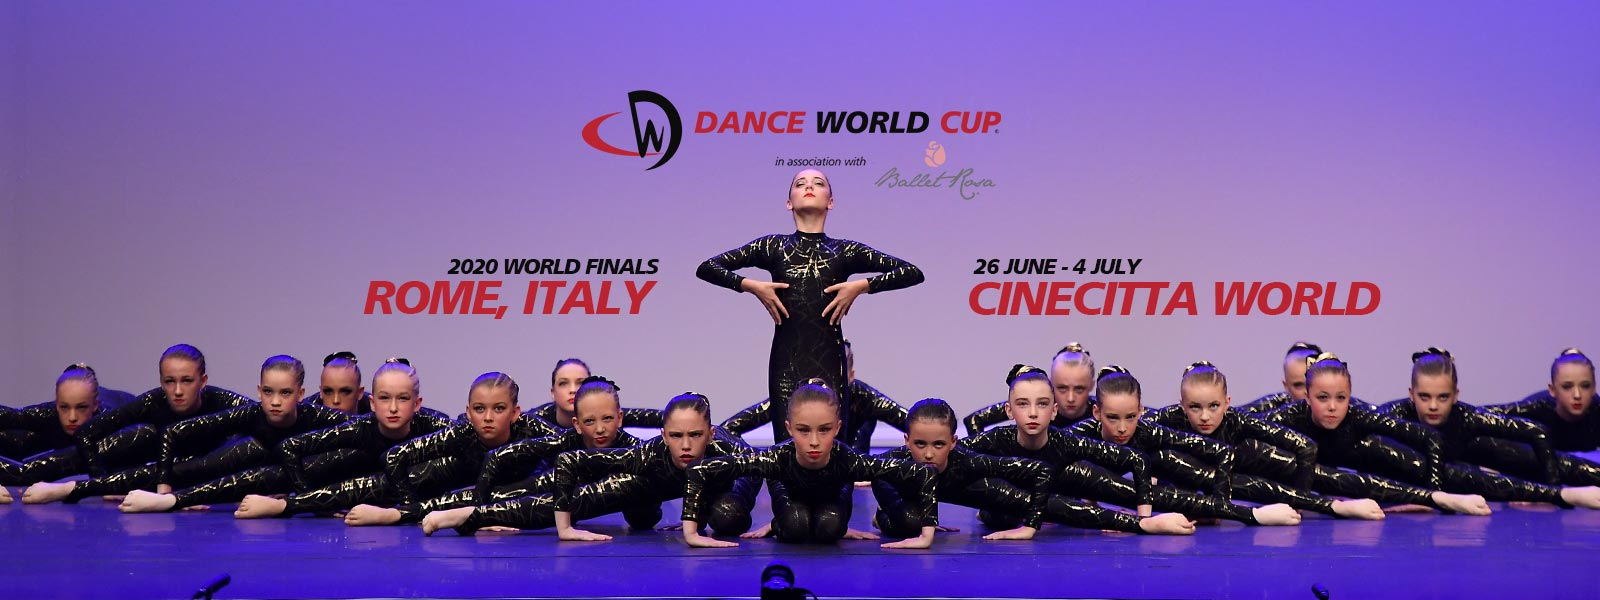 German World Cup Team 2020.Dance World Cup